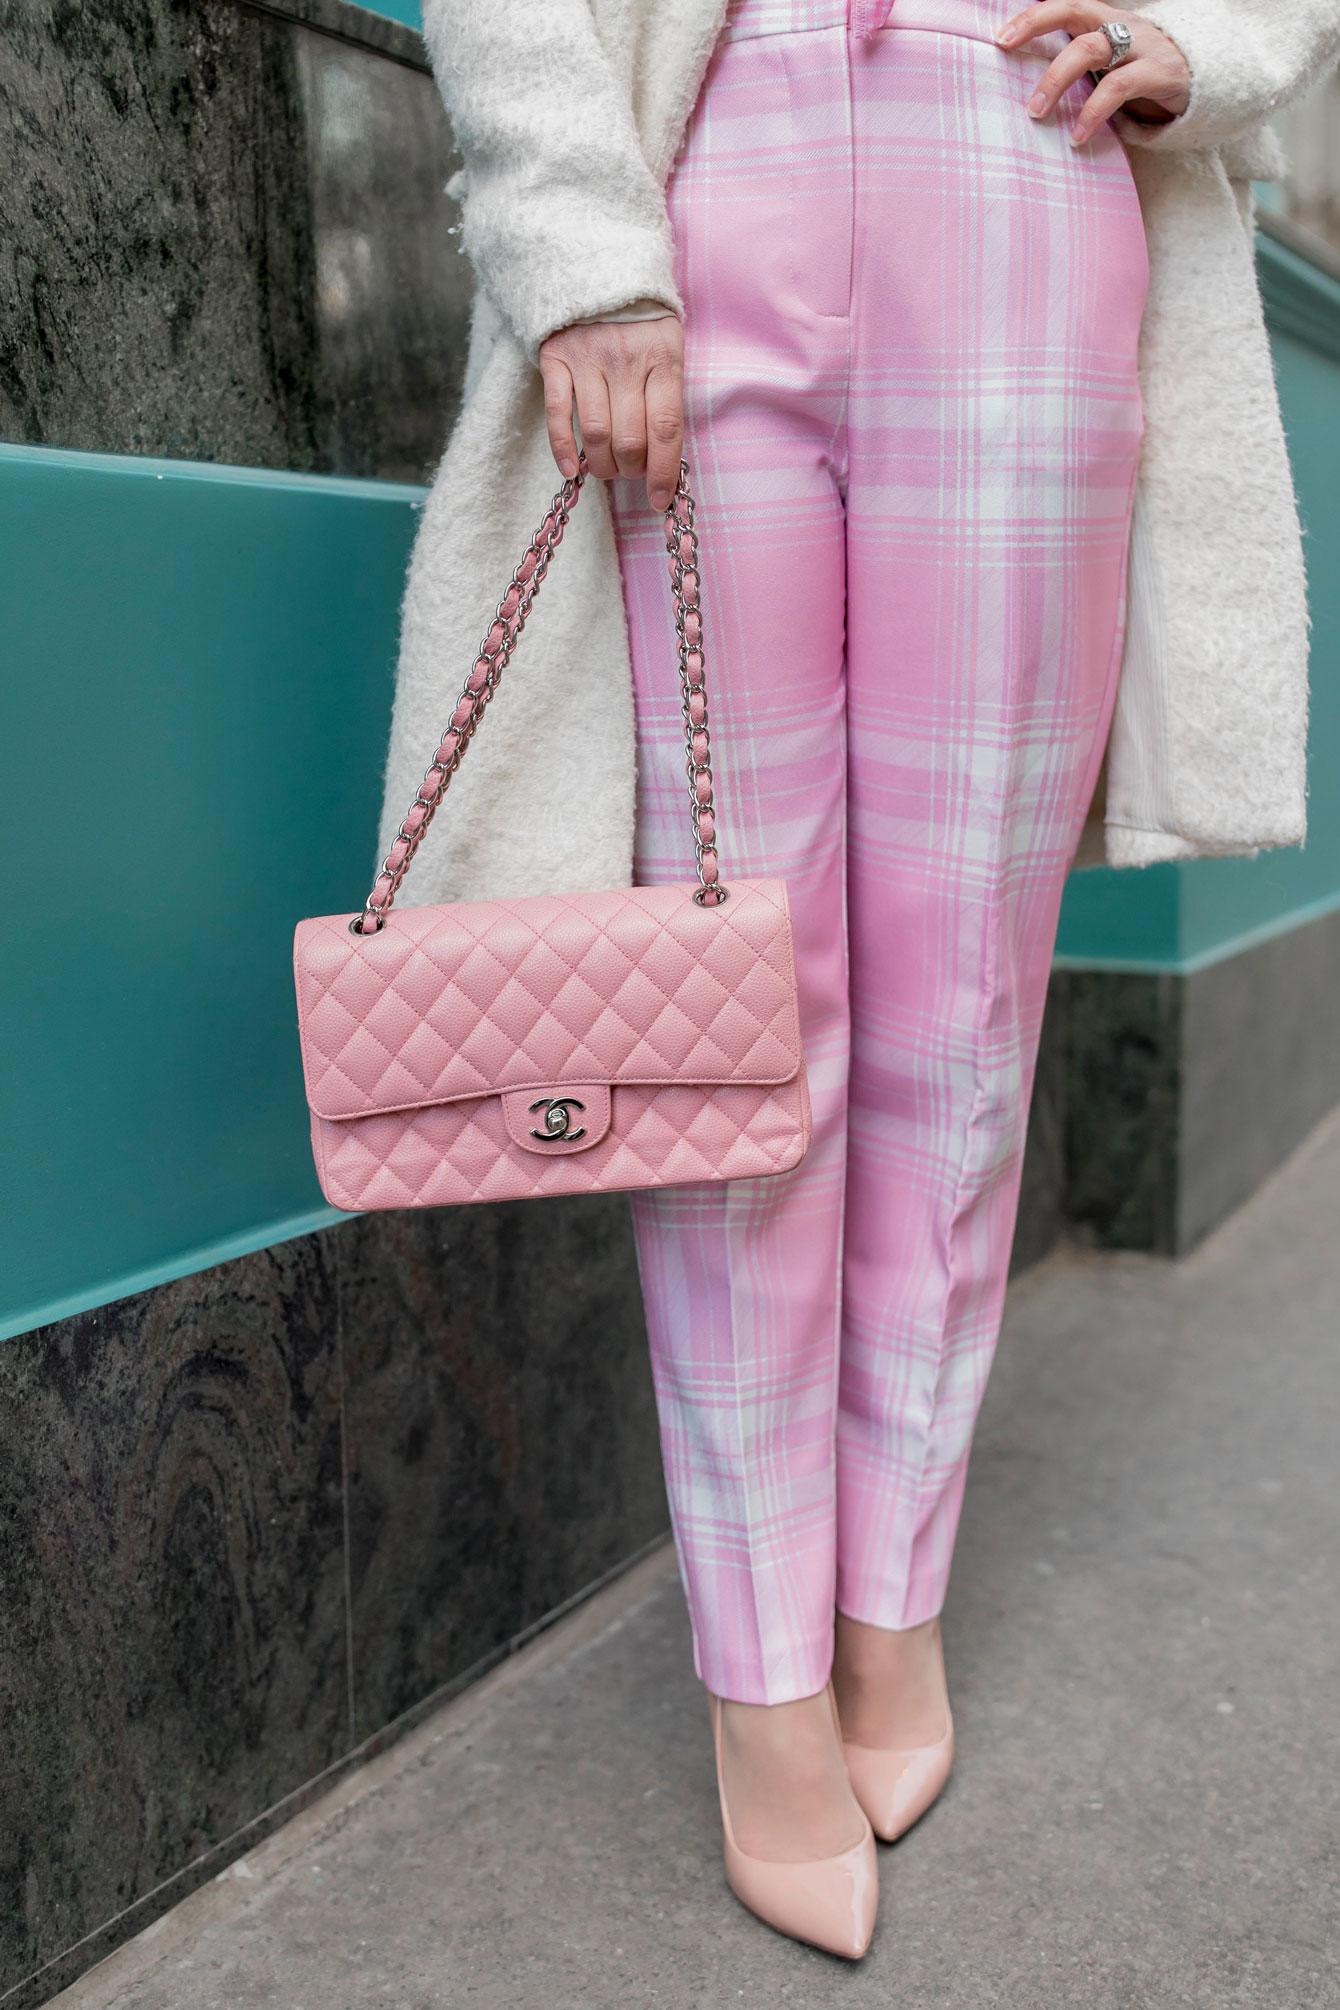 Chanel Caviar Pink Flap Bag